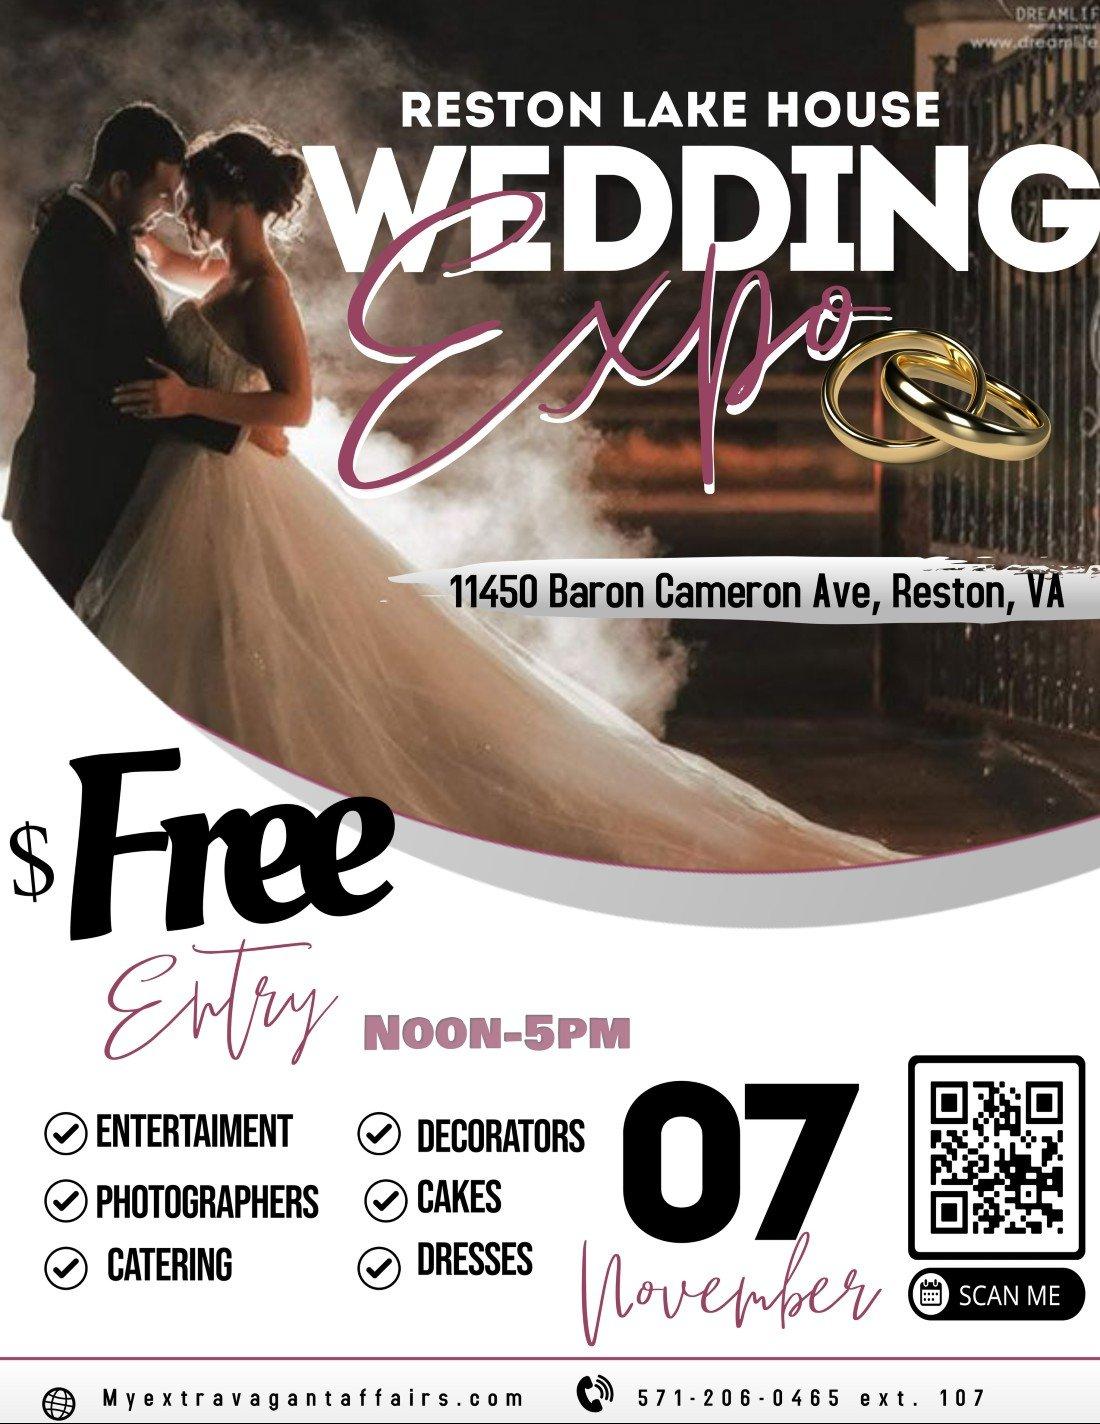 Reston Lake House Bridal Expo, 7 November | Event in Reston | AllEvents.in